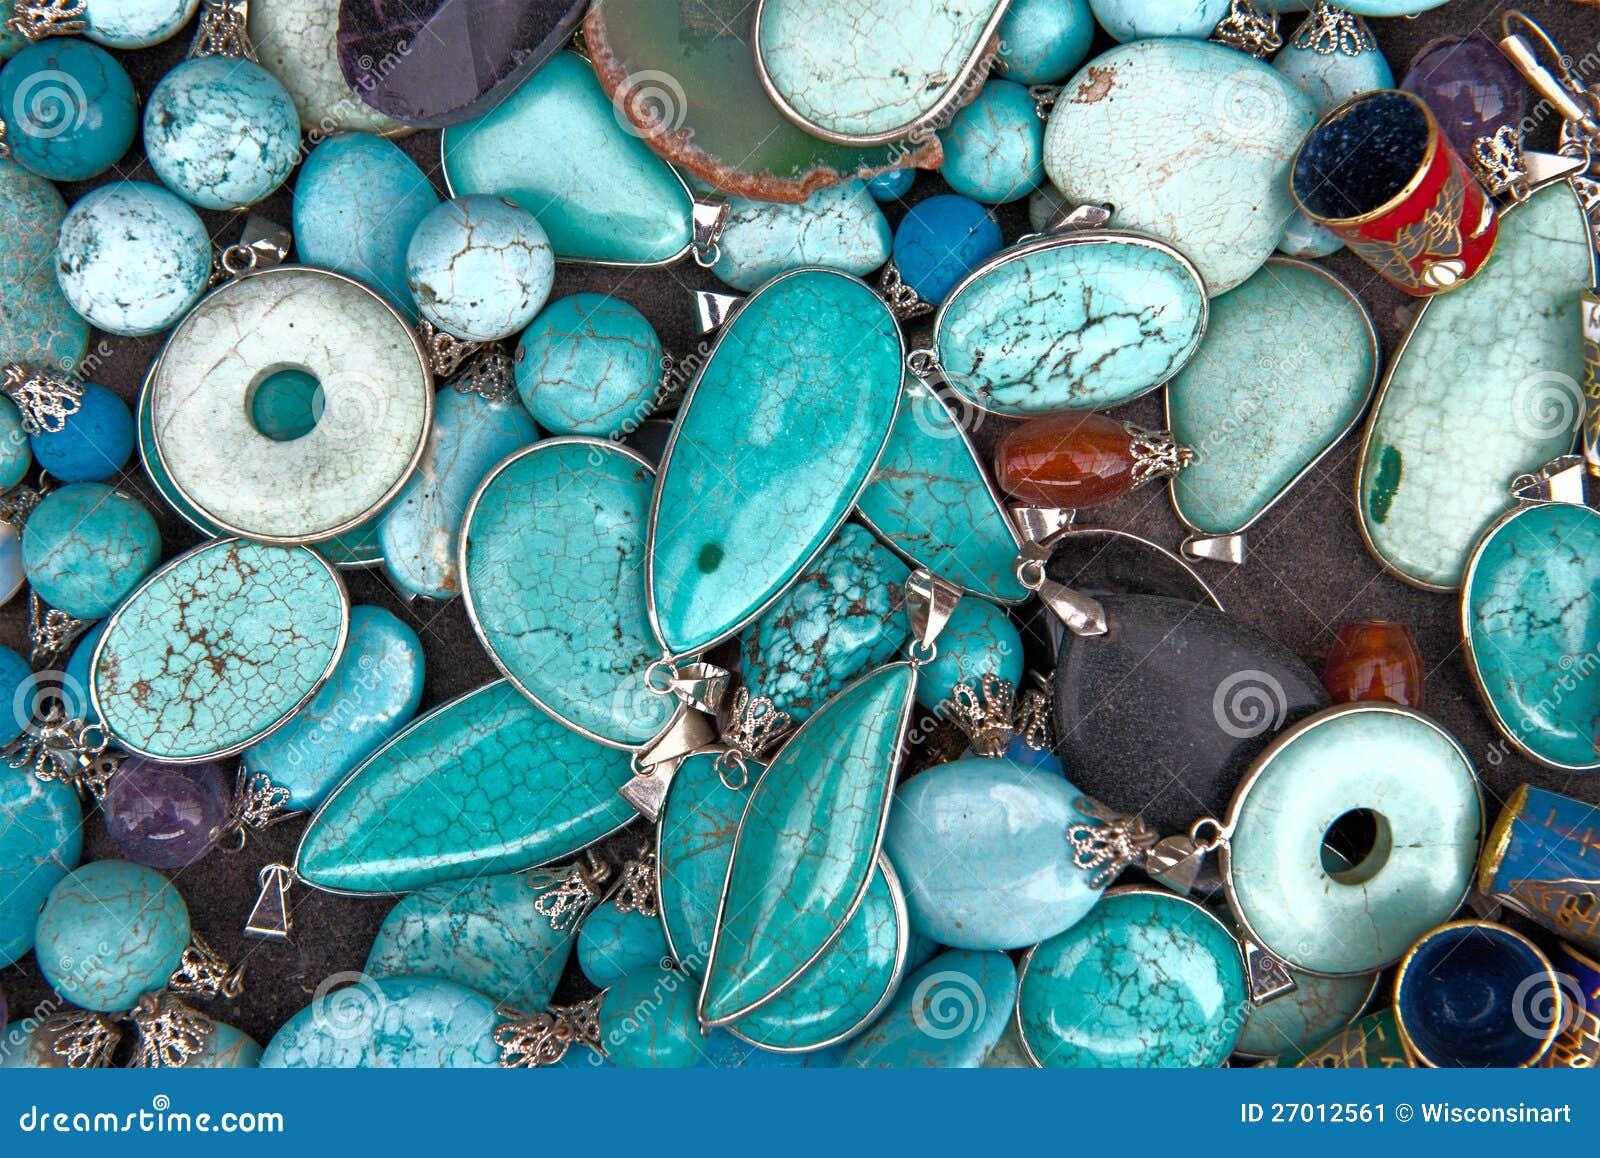 Colorful Turquoise Semi Precious Gemstones Jewelry